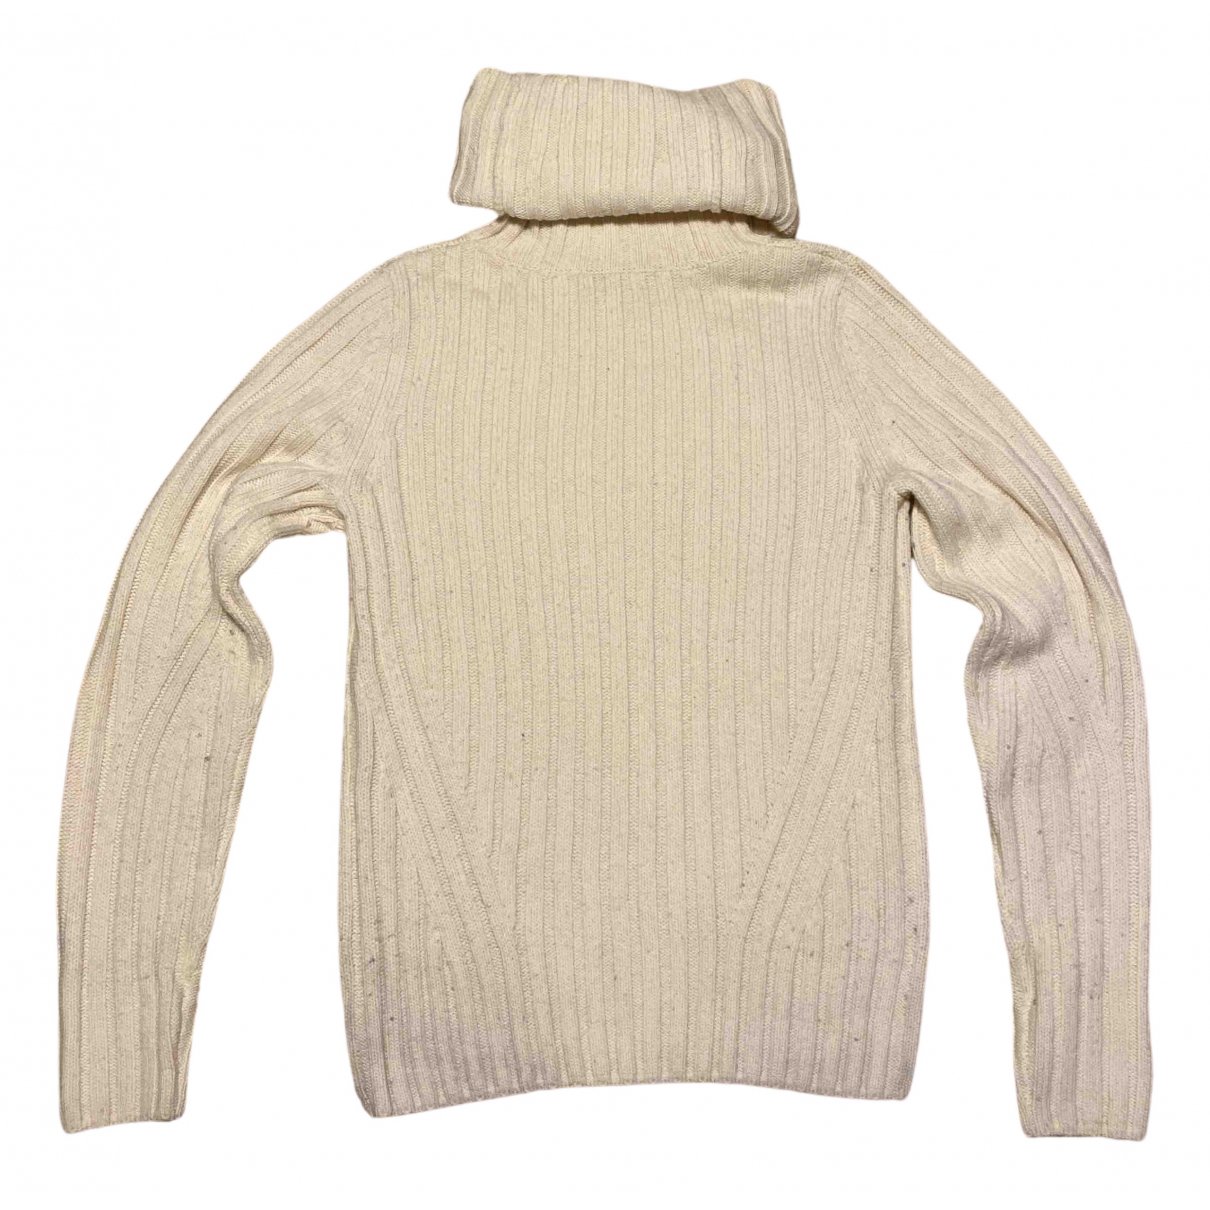 Dries Van Noten \N Pullover in  Weiss Wolle